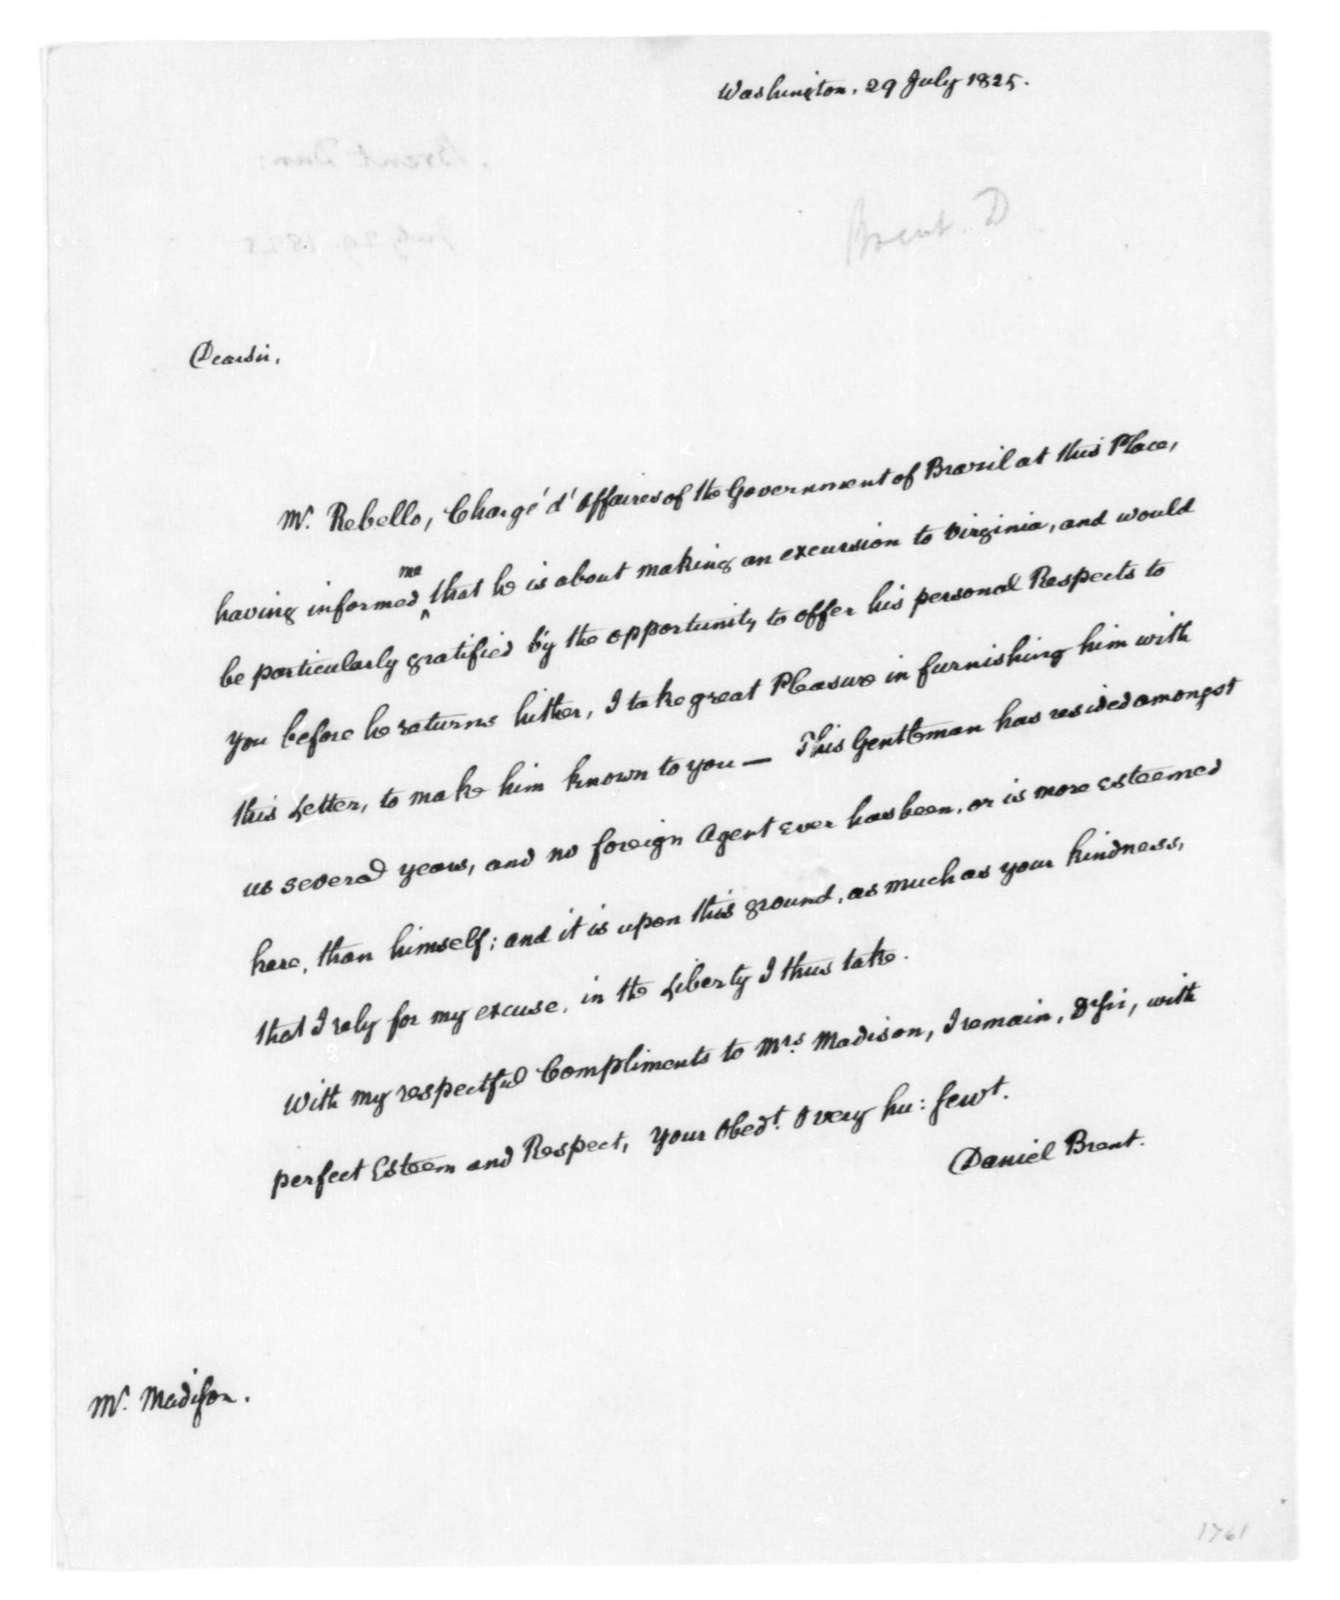 Daniel Brent to James Madison, July 29, 1825.